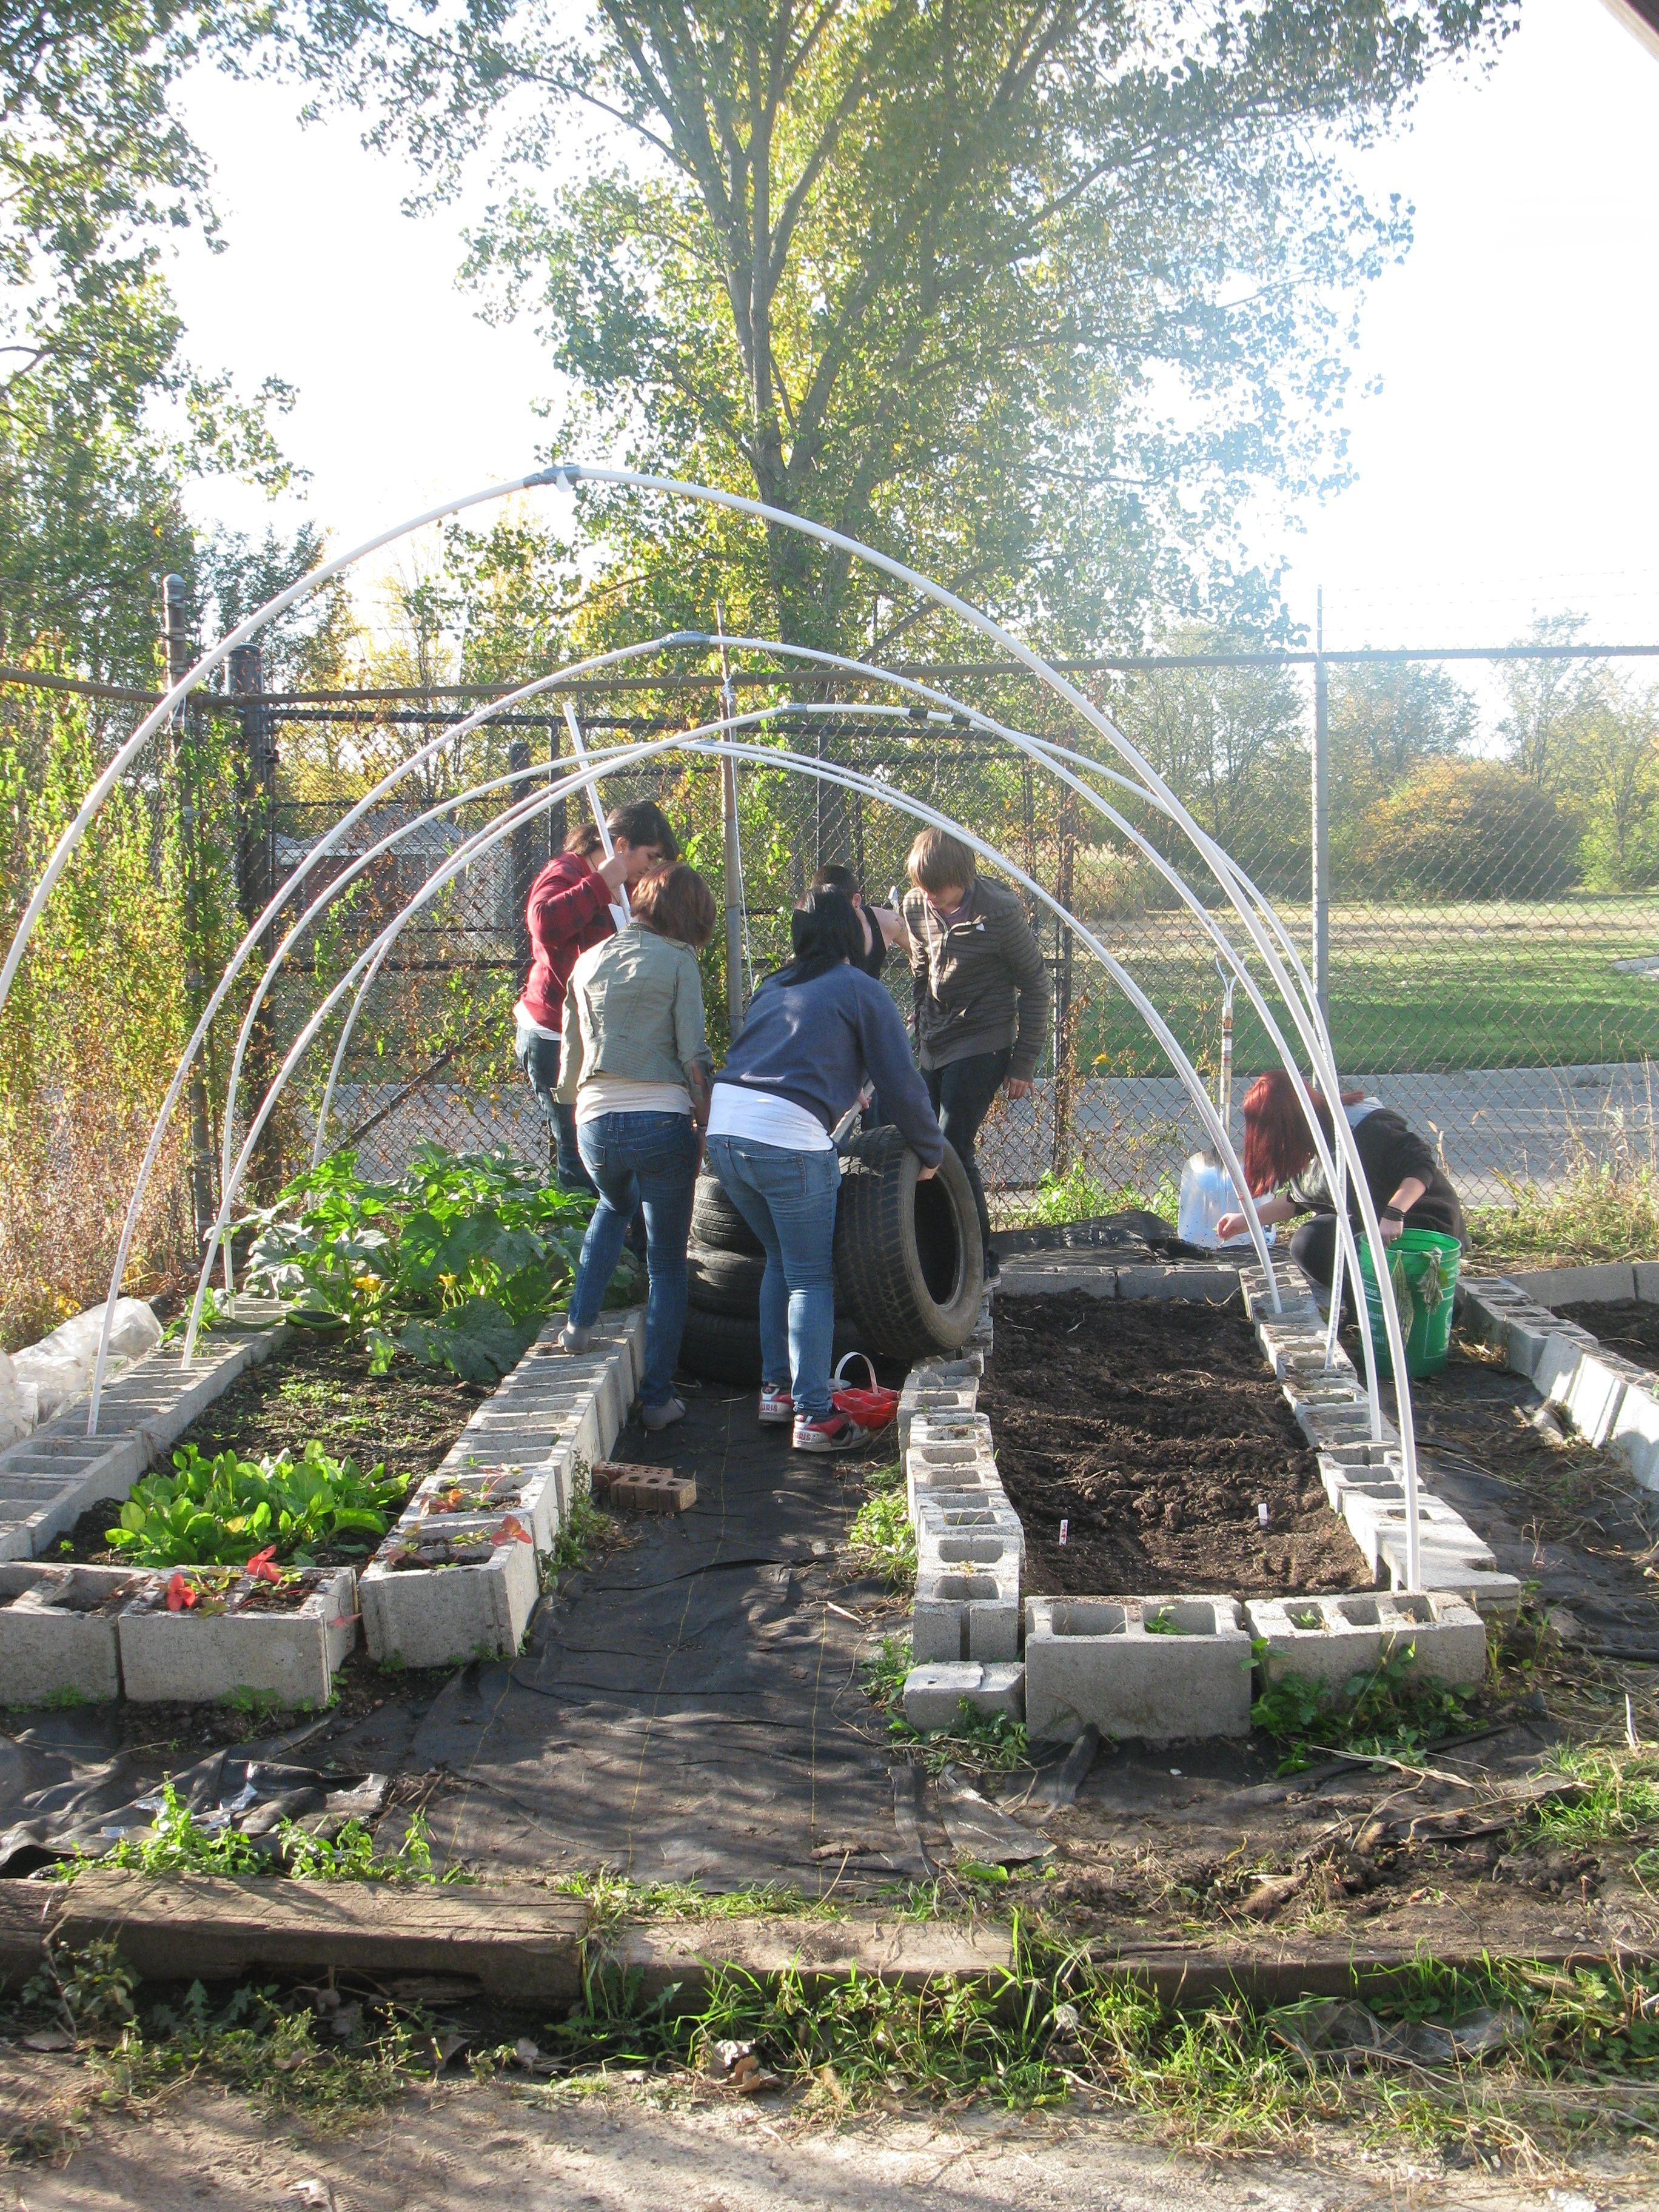 Garden Ideas How Easy Put The Pvc Or Conduit Poles